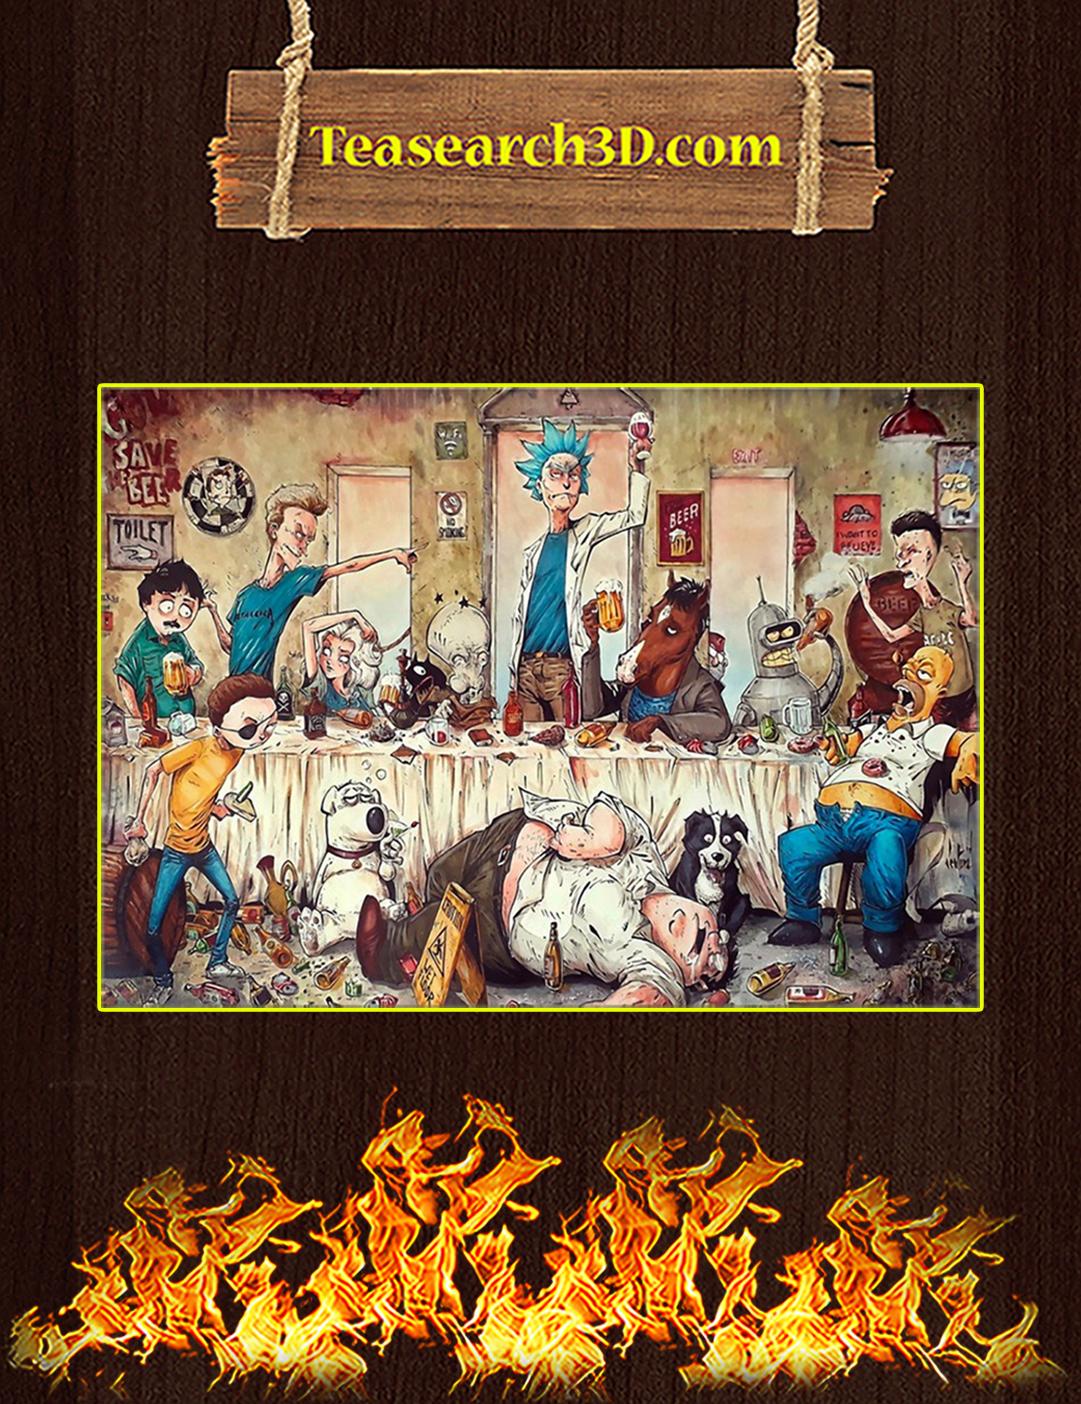 Adult cartoons art work by marcelo ventura poster A2